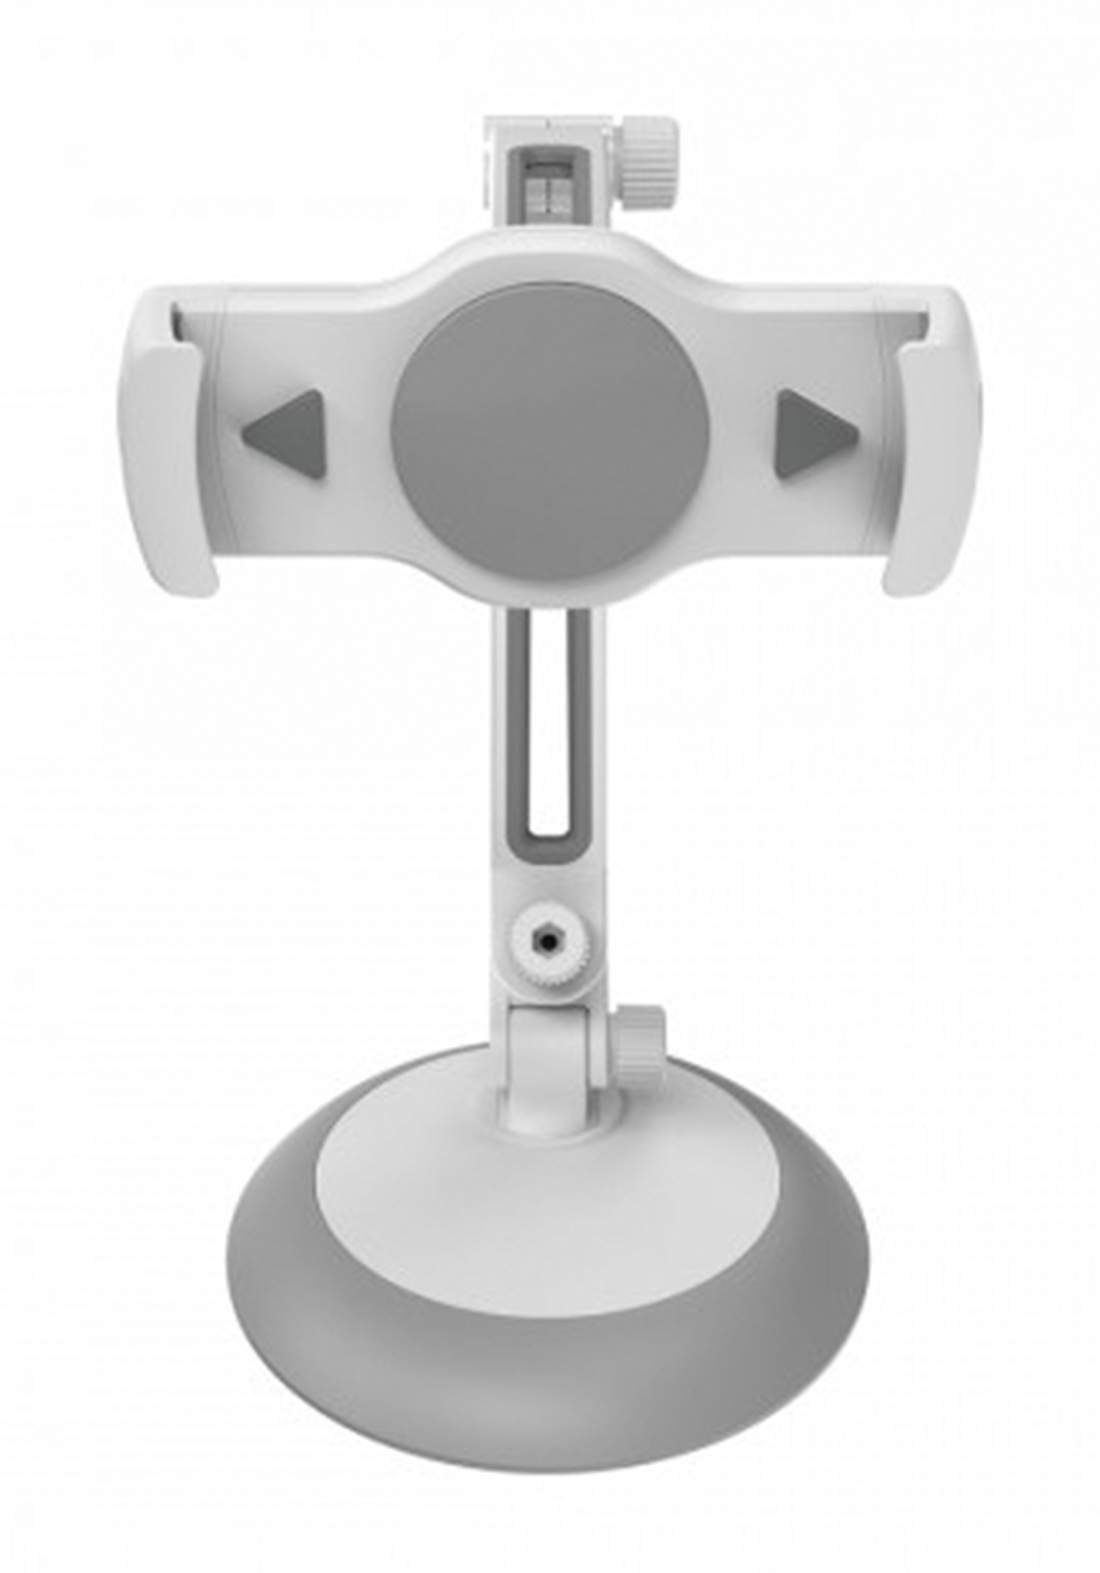 Rock (RPH-0878)10.5 Inch Phones Tablets Universal Adjustable Desktop Stand - White